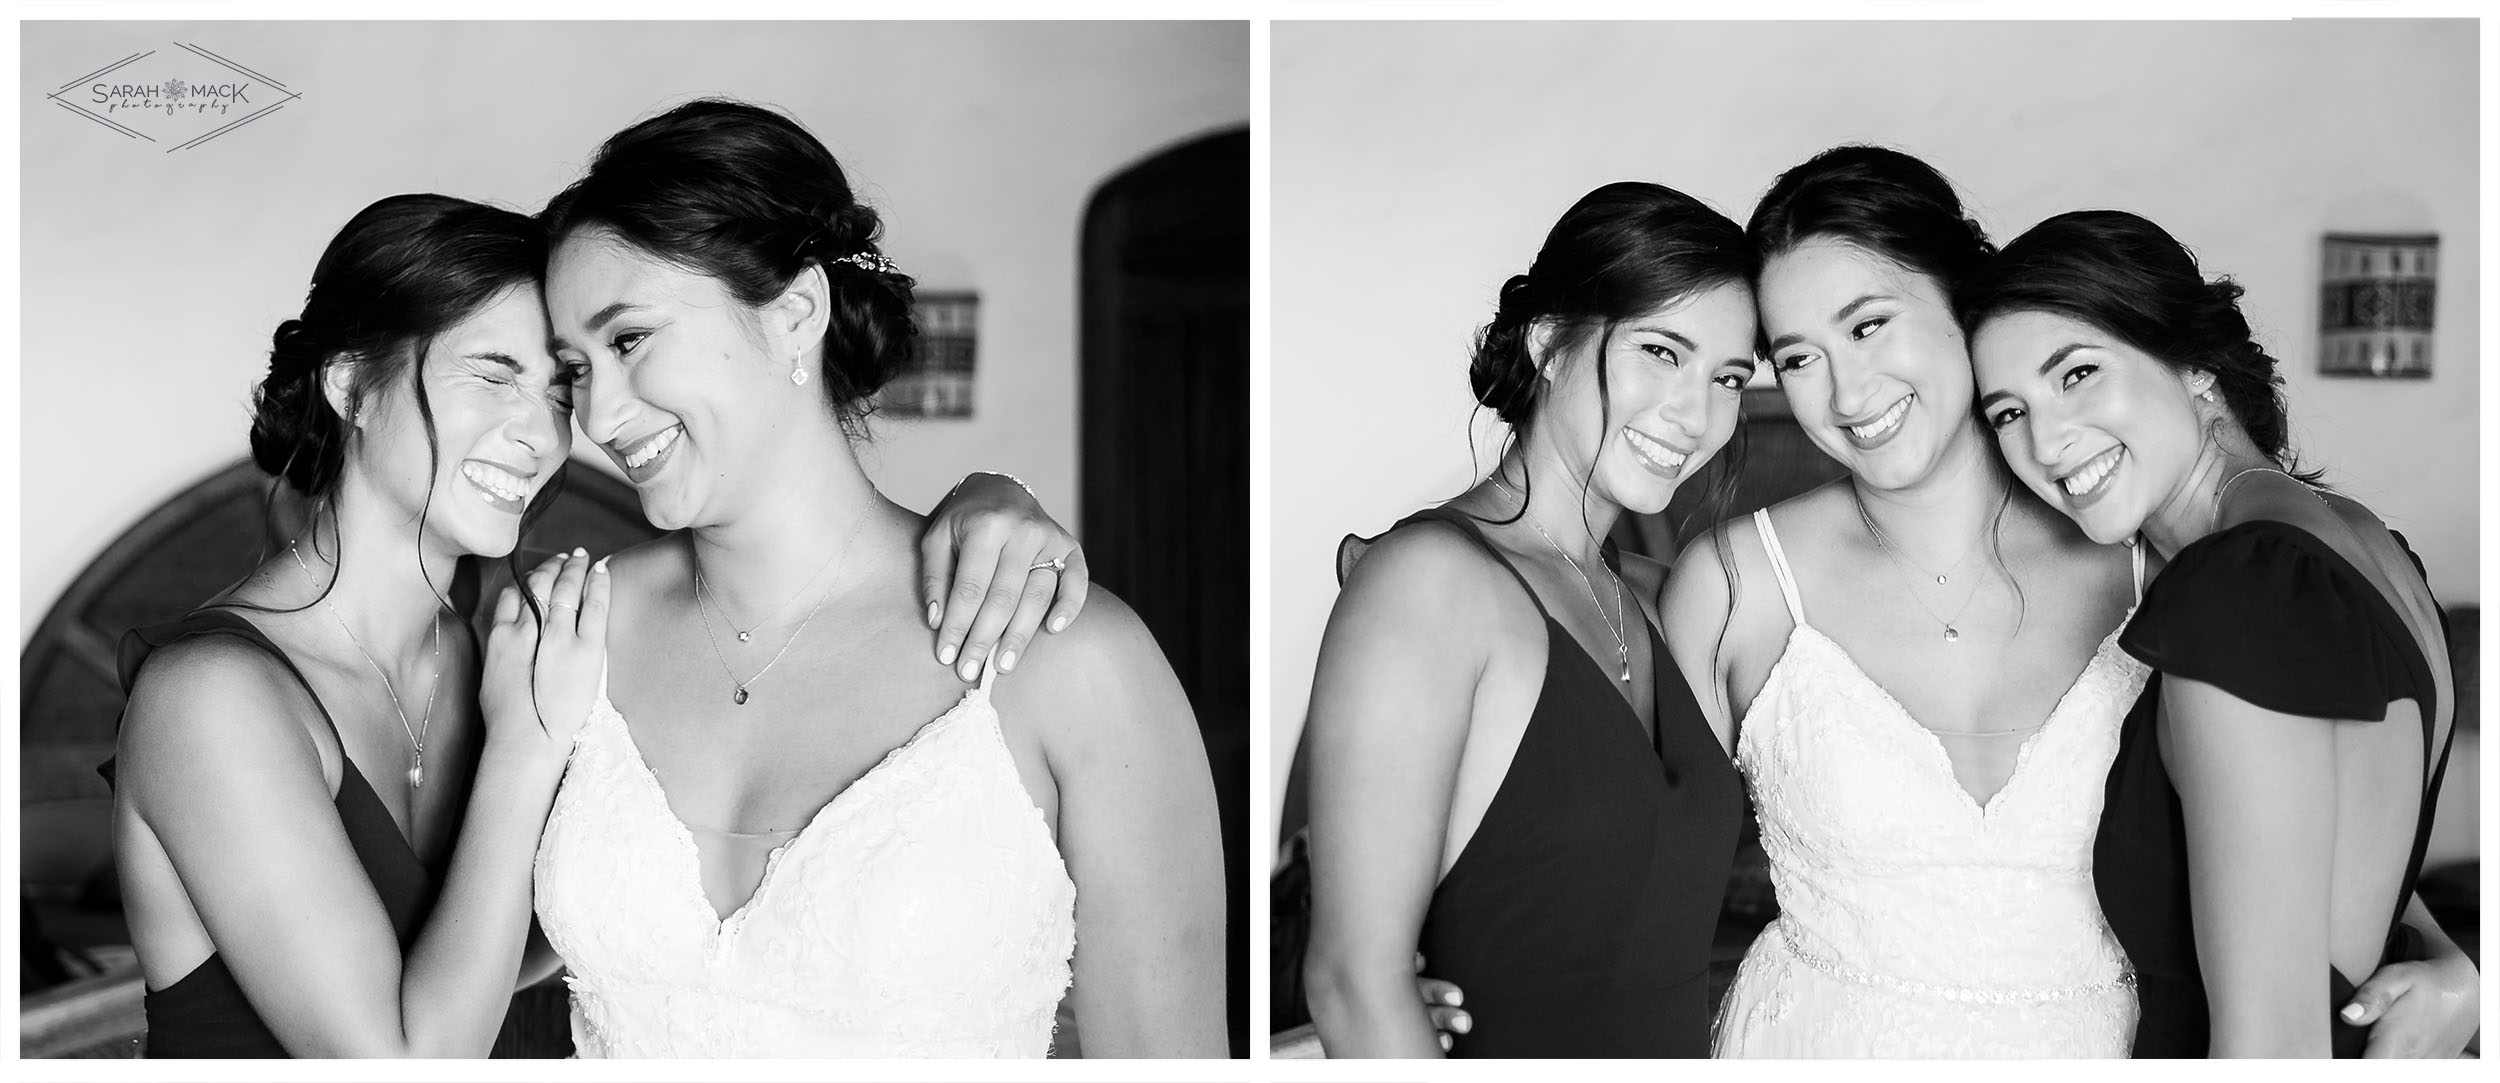 ES-Flor-de-Playa-Sayulita-Wedding-Photography-17.jpg